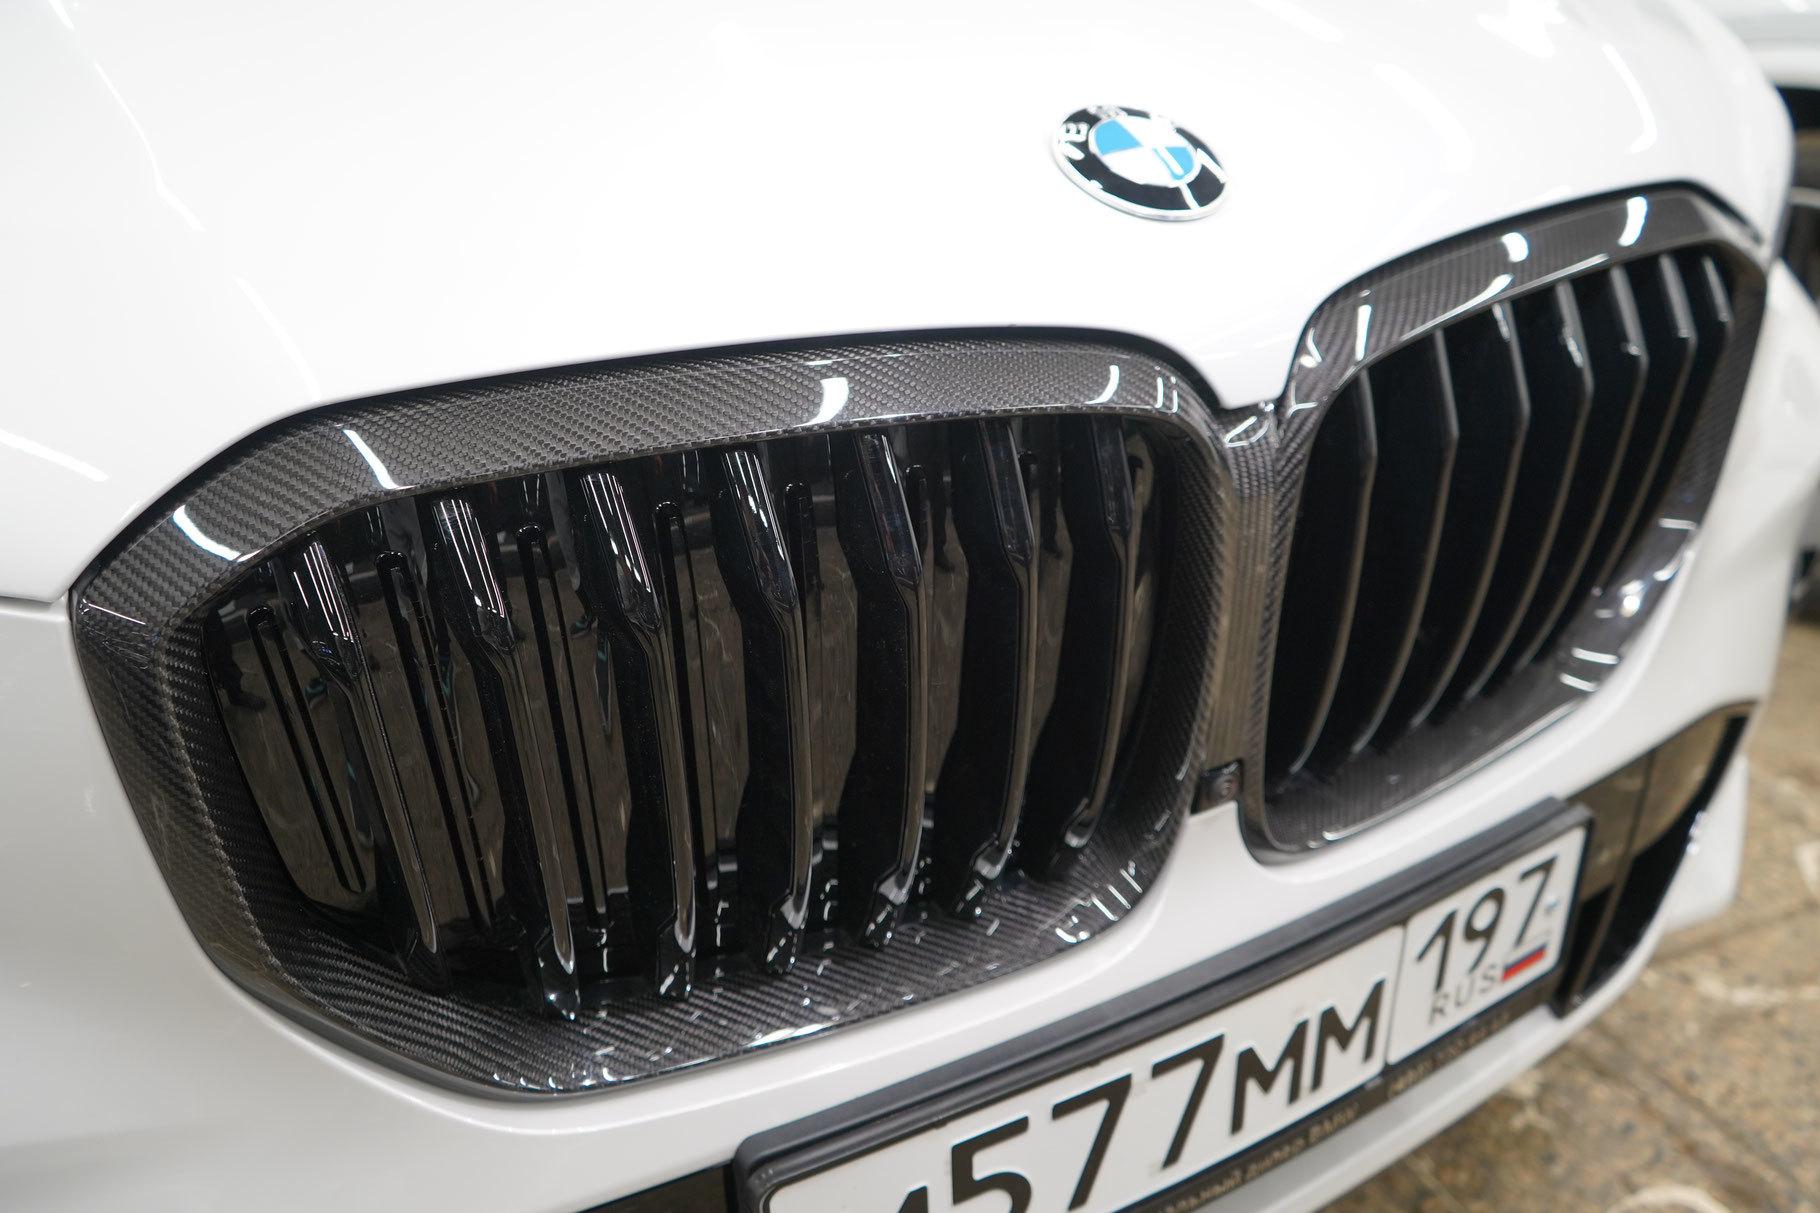 Hodoor Performance Carbon fiber radiator grille frame BMW x5 G05